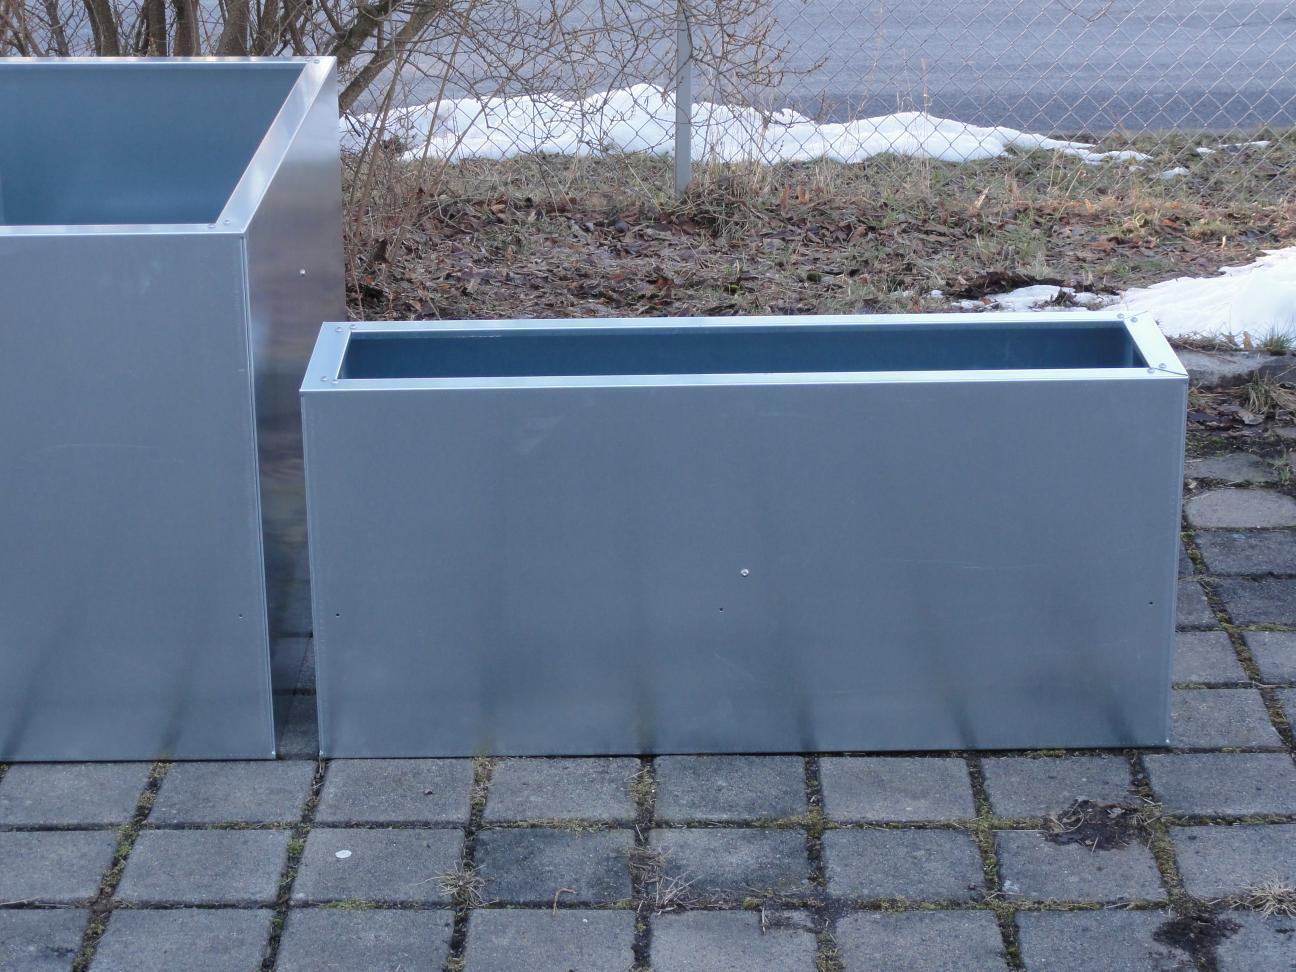 Urban Metall 1,5 m x 1,5 m Höhe 0,7 m - verzinkt